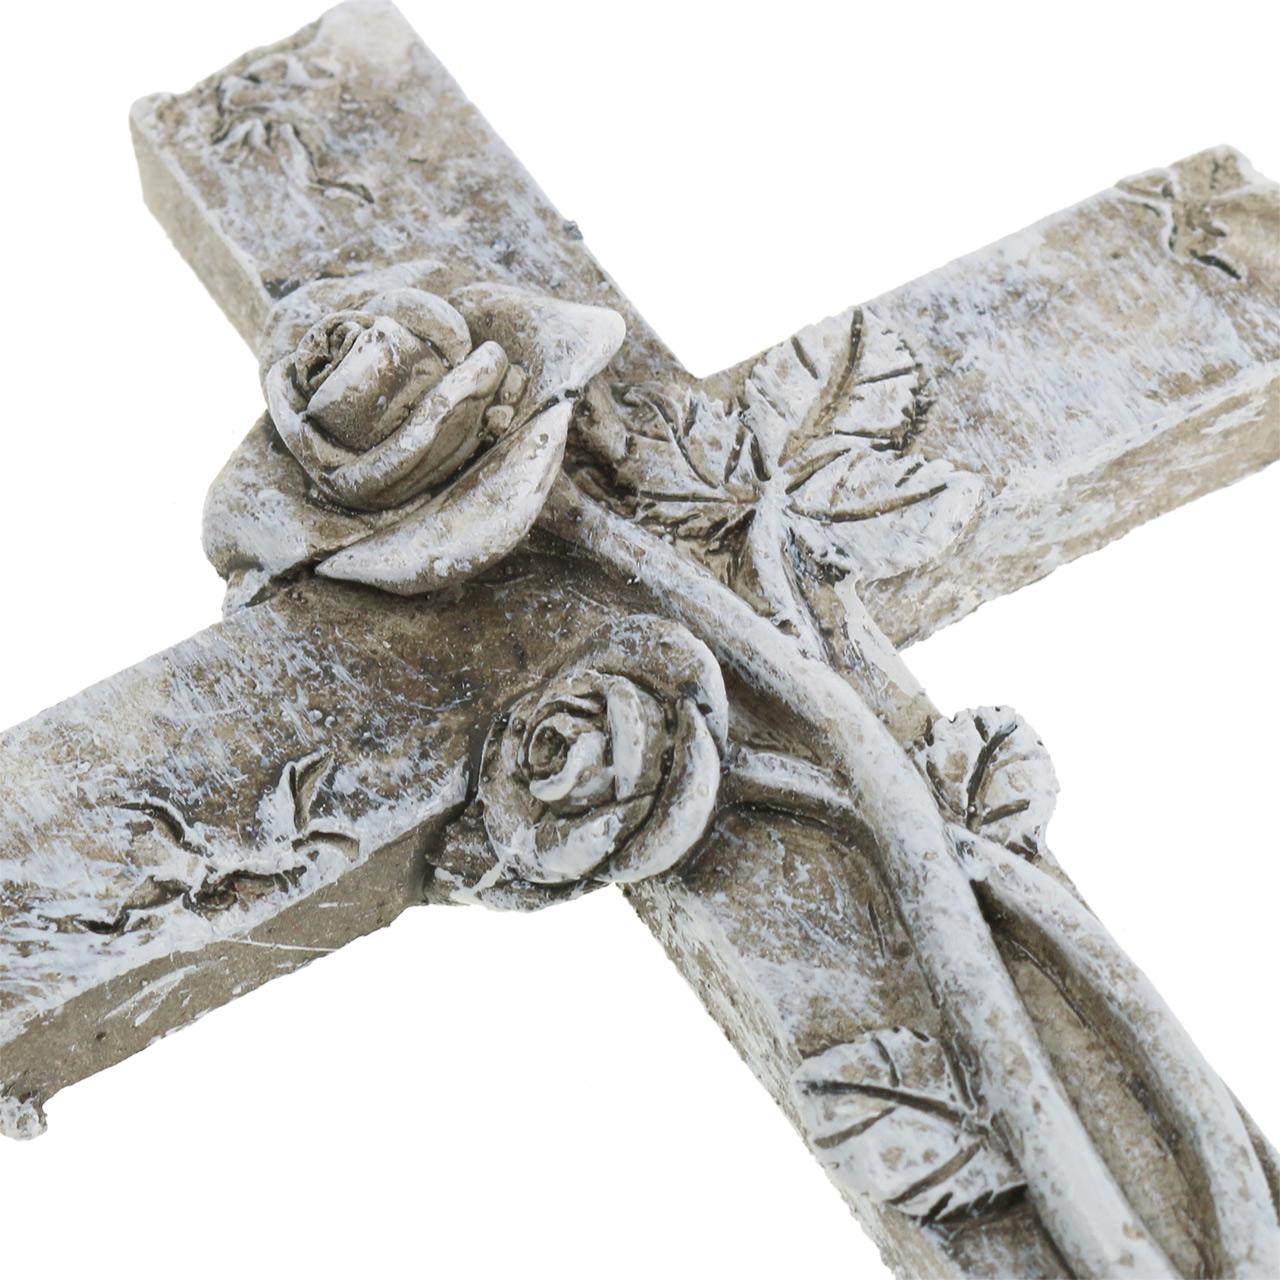 Hautakoristeellinen risti 7,5 cm x 11 cm 4 kpl